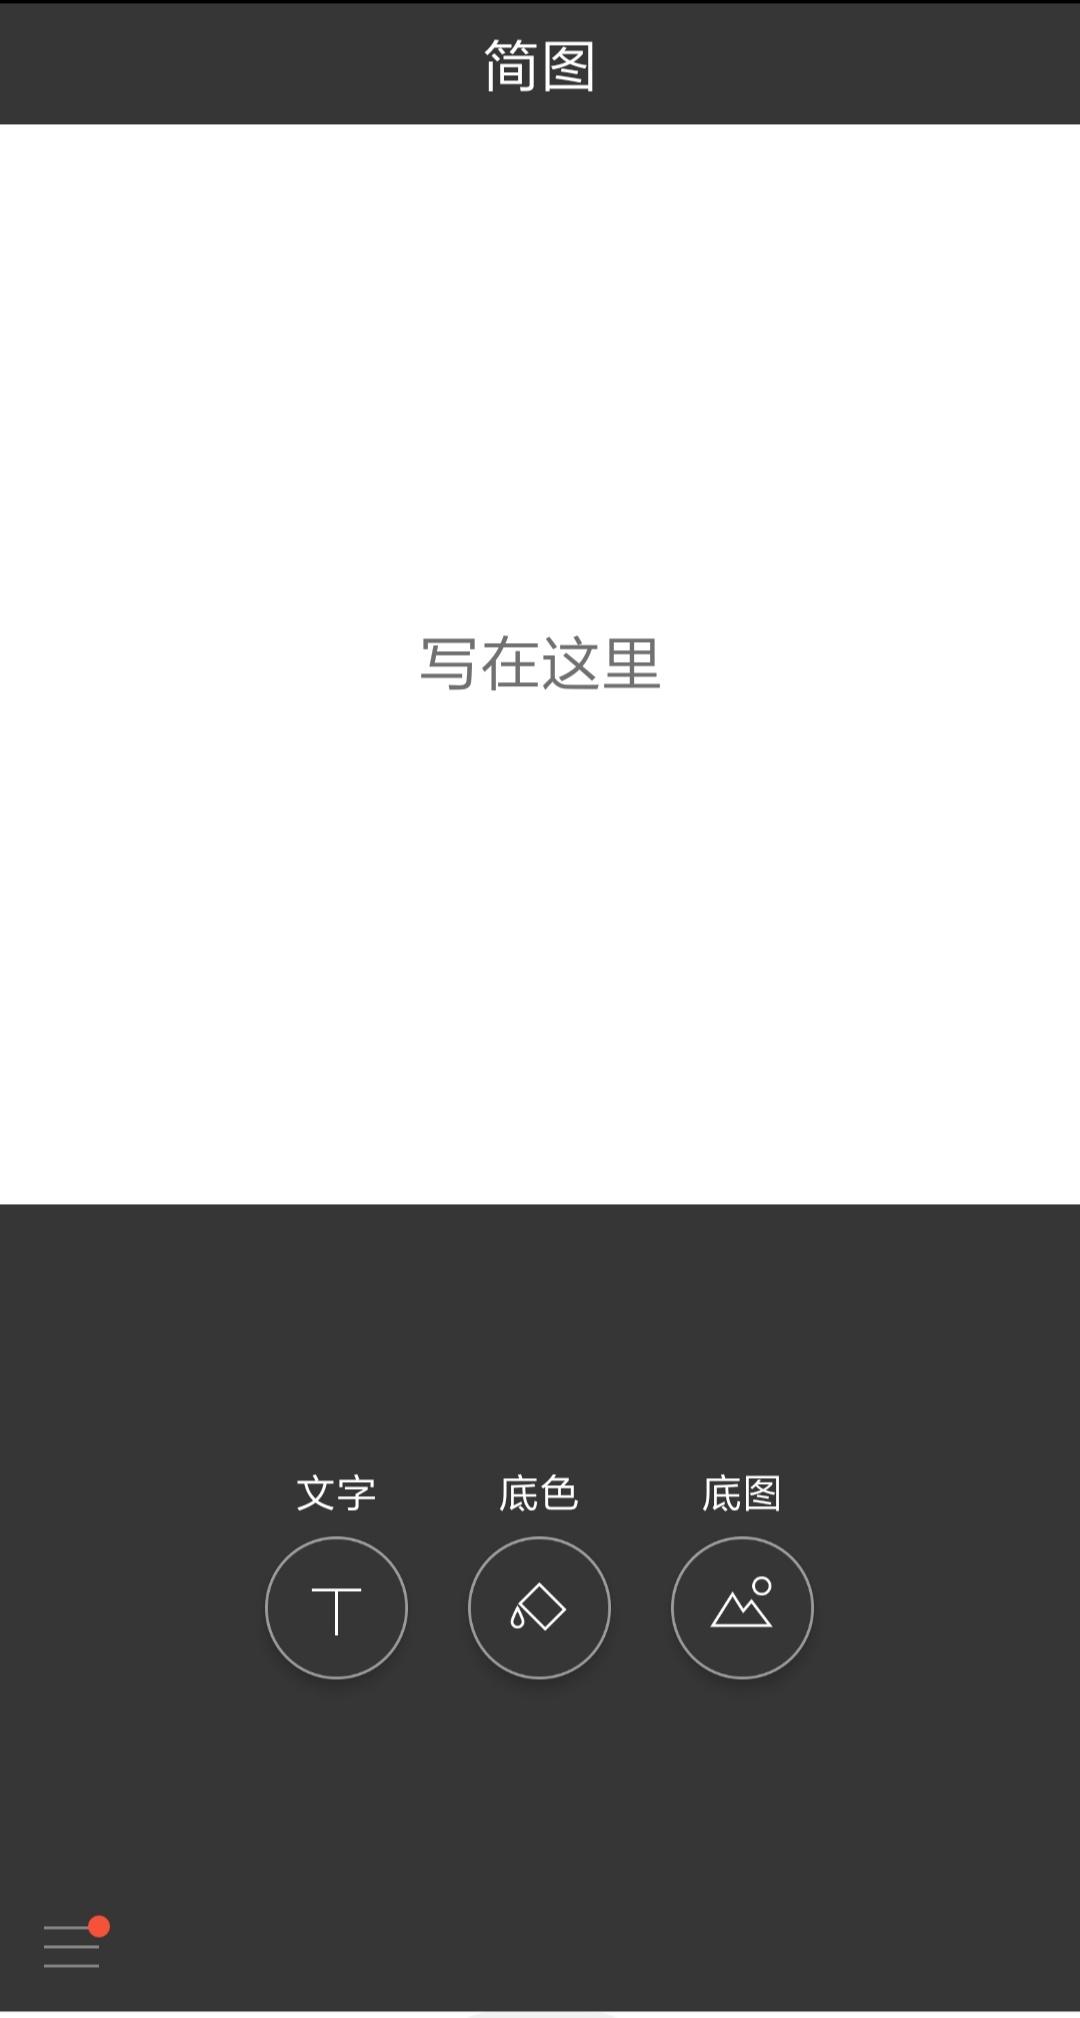 IMG_20181209_202330.jpg